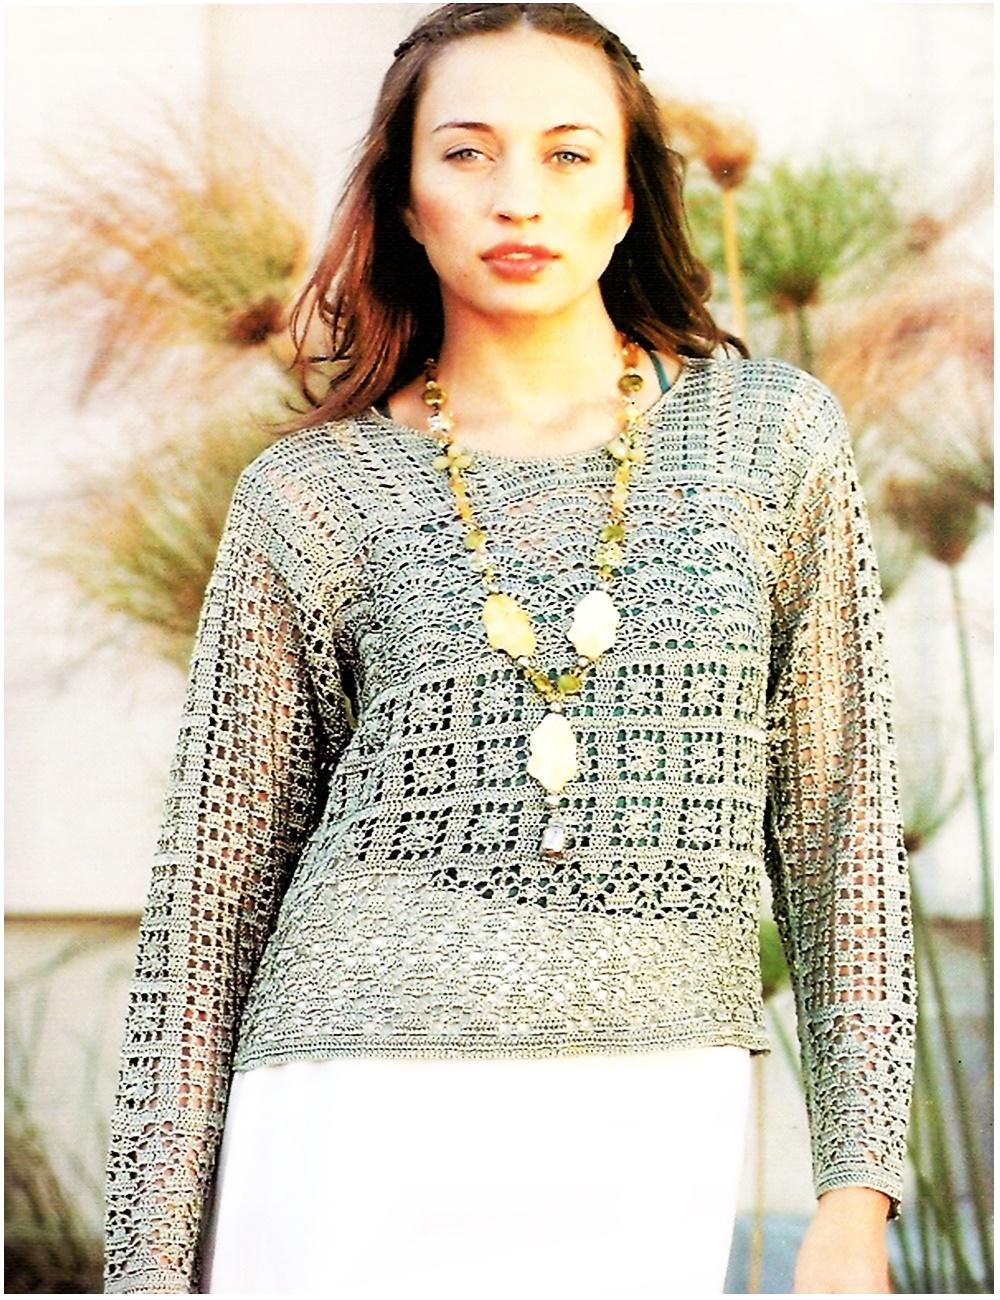 pulover, jersey, ganchillo, crochet, gráfico, patrón